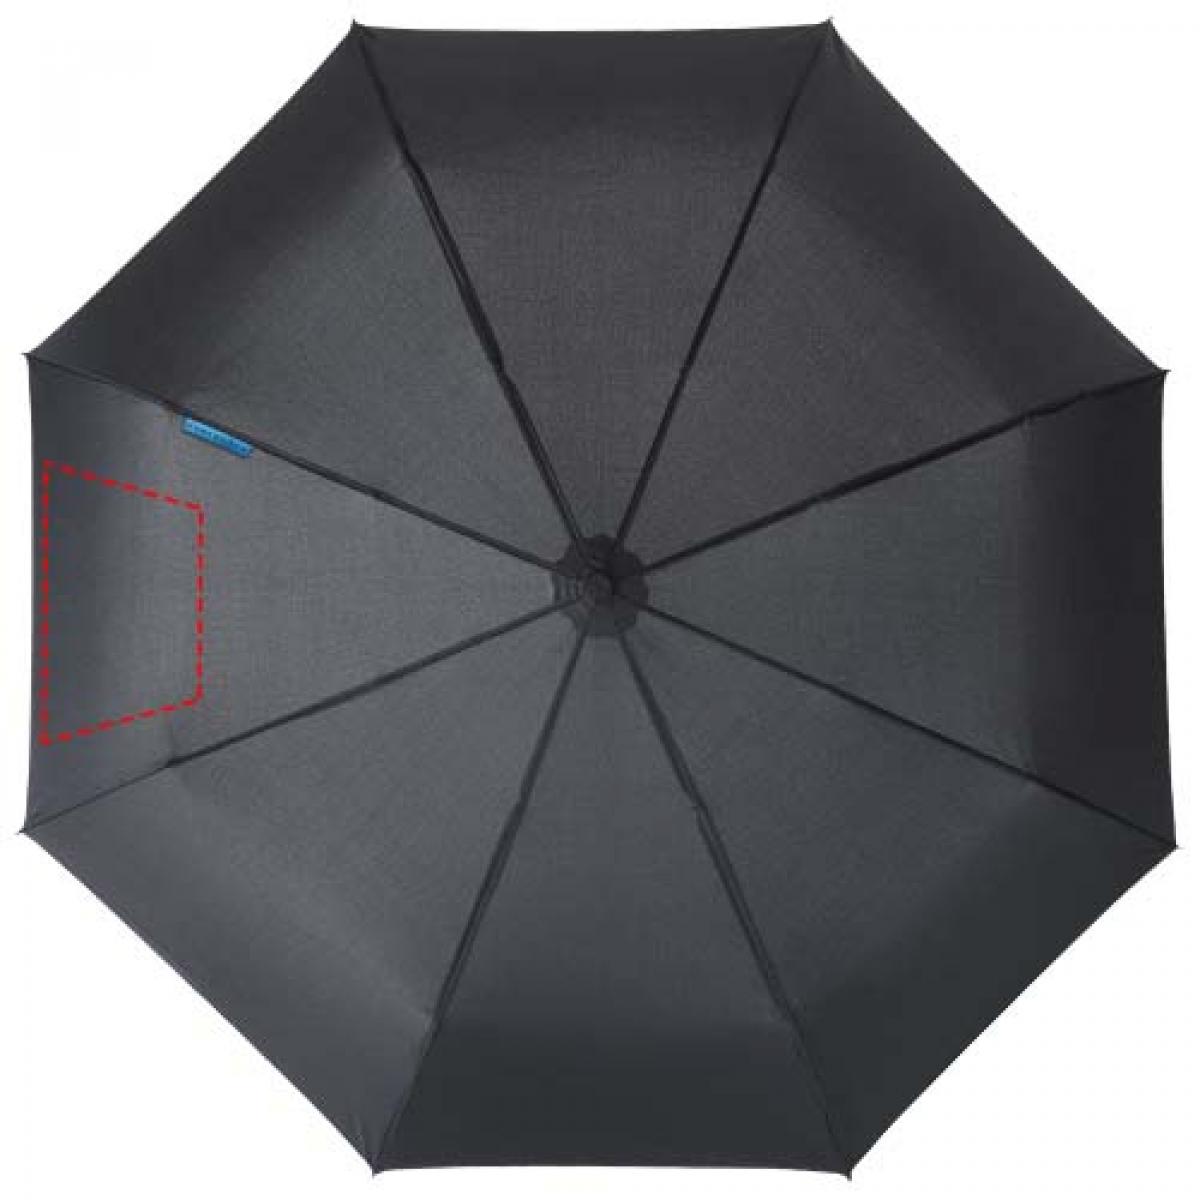 Marksman 3-delige opvouwbare paraplu